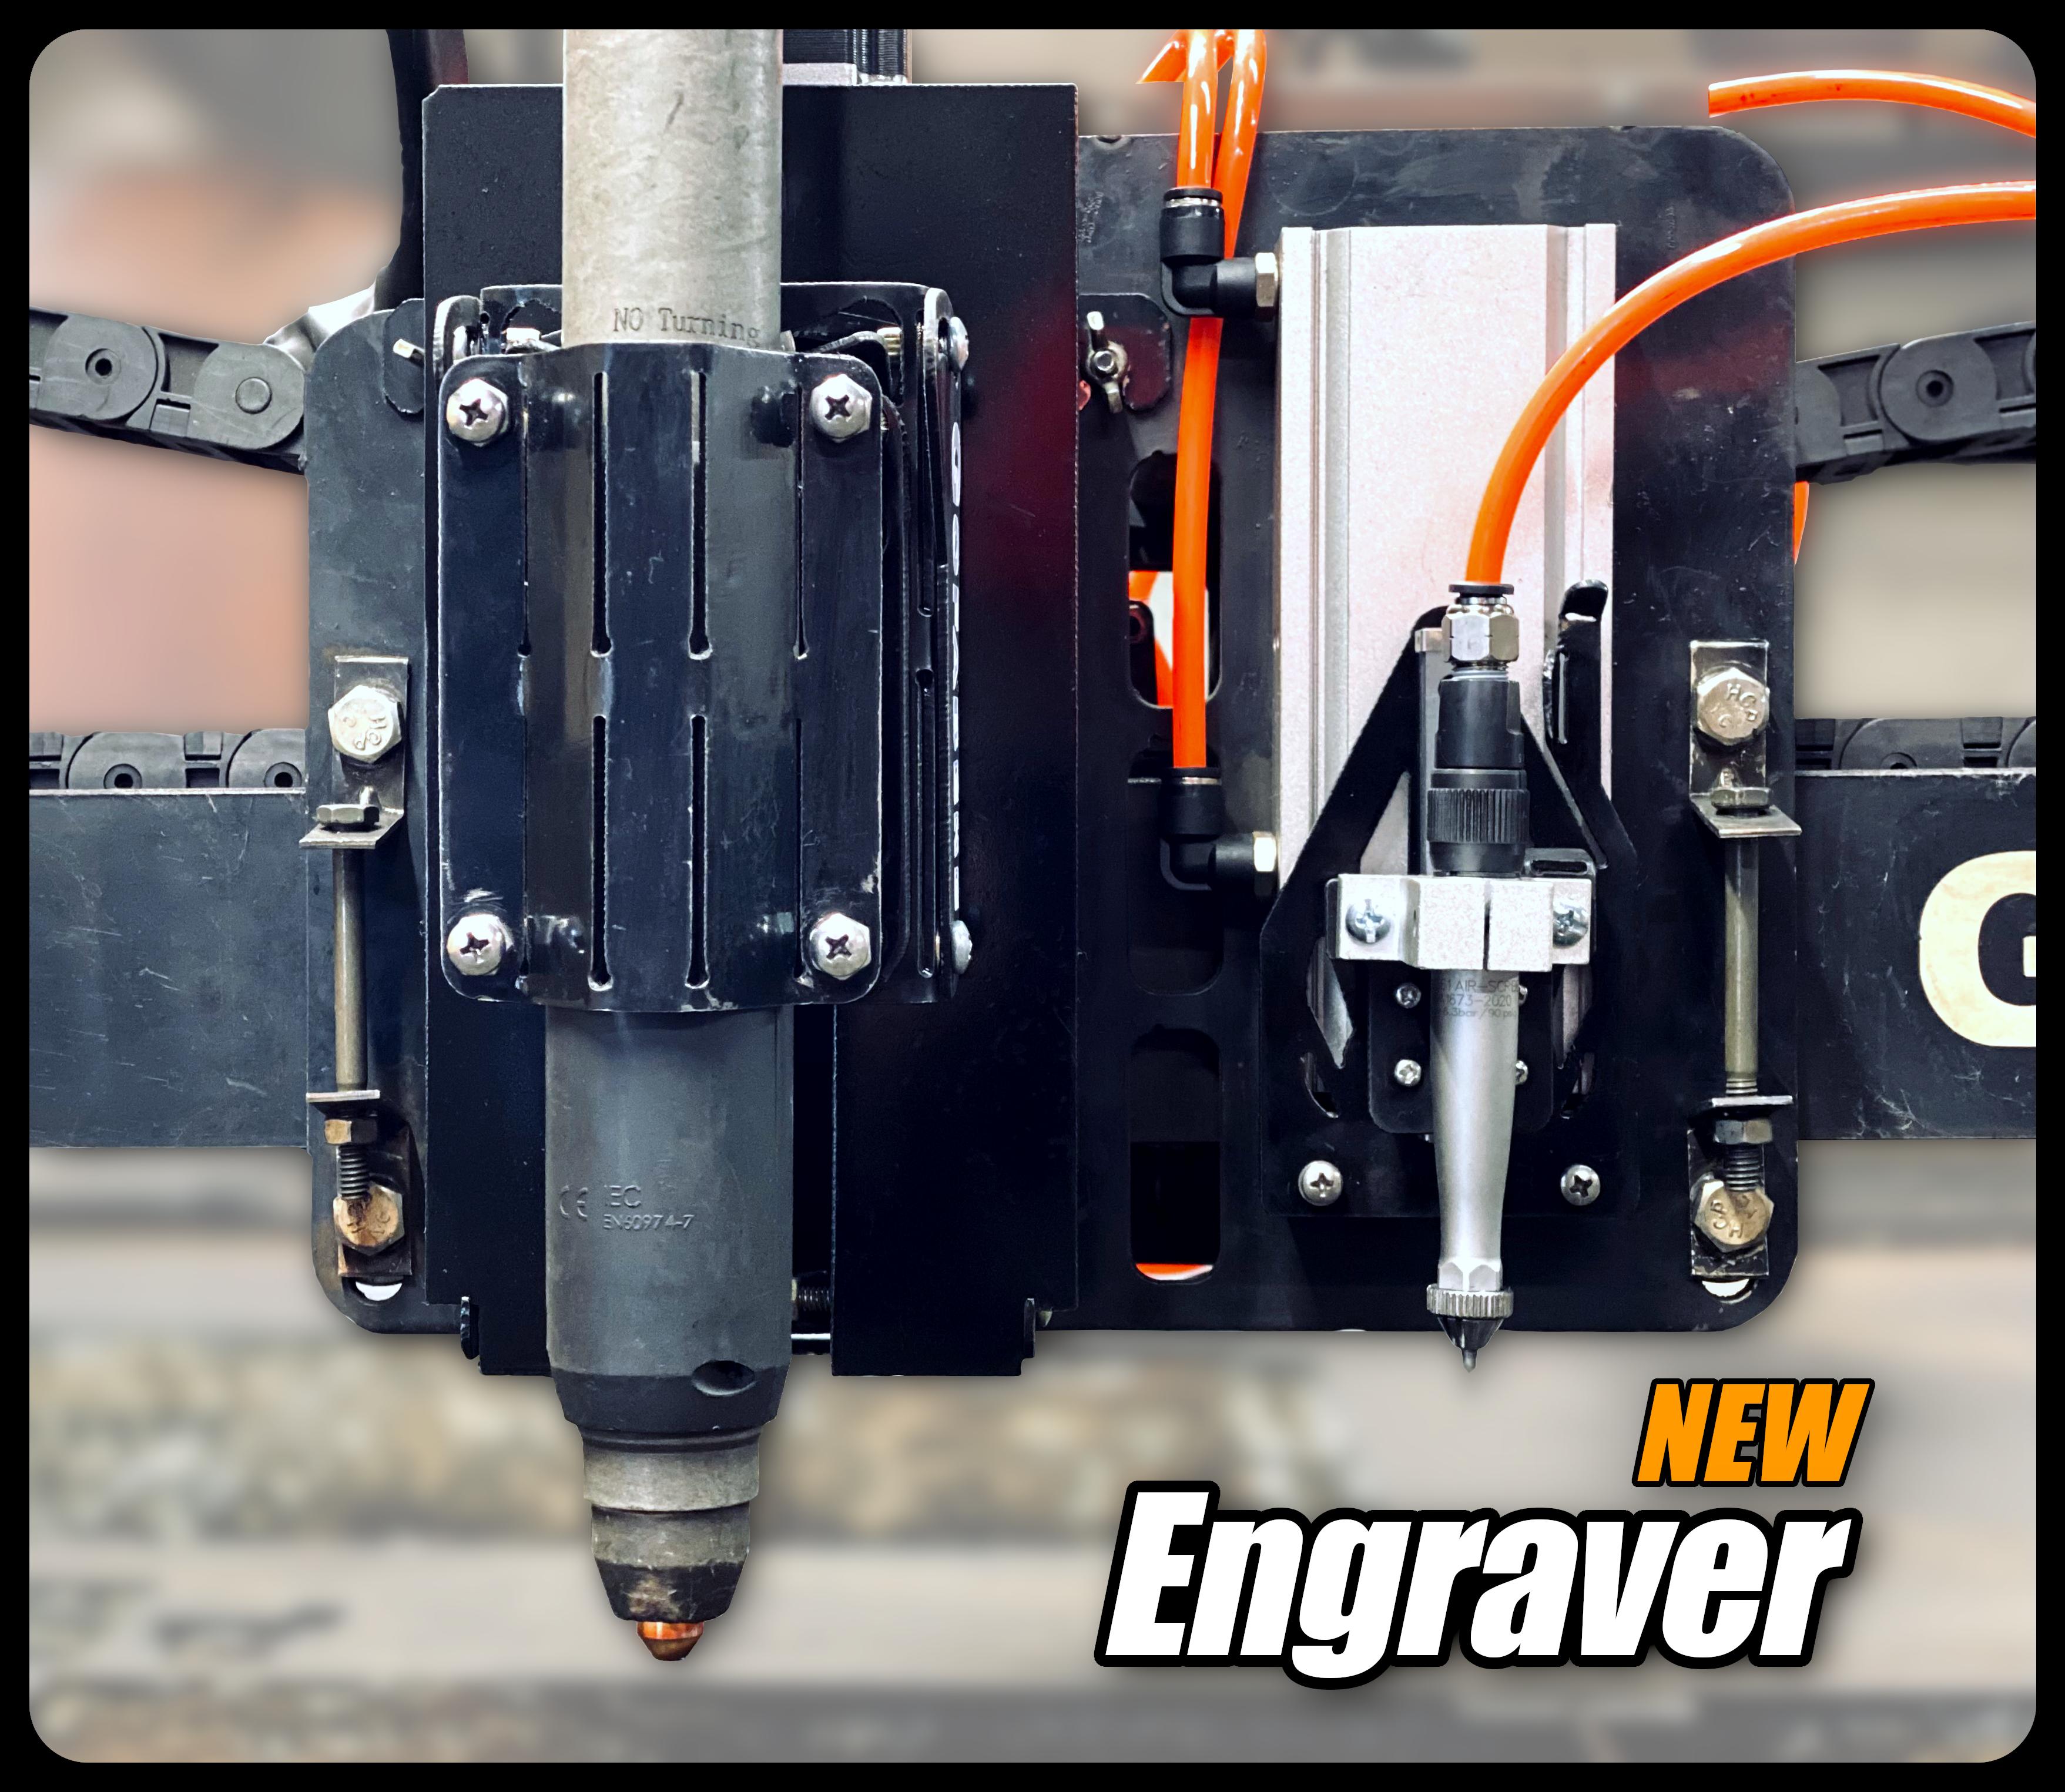 Engraver2